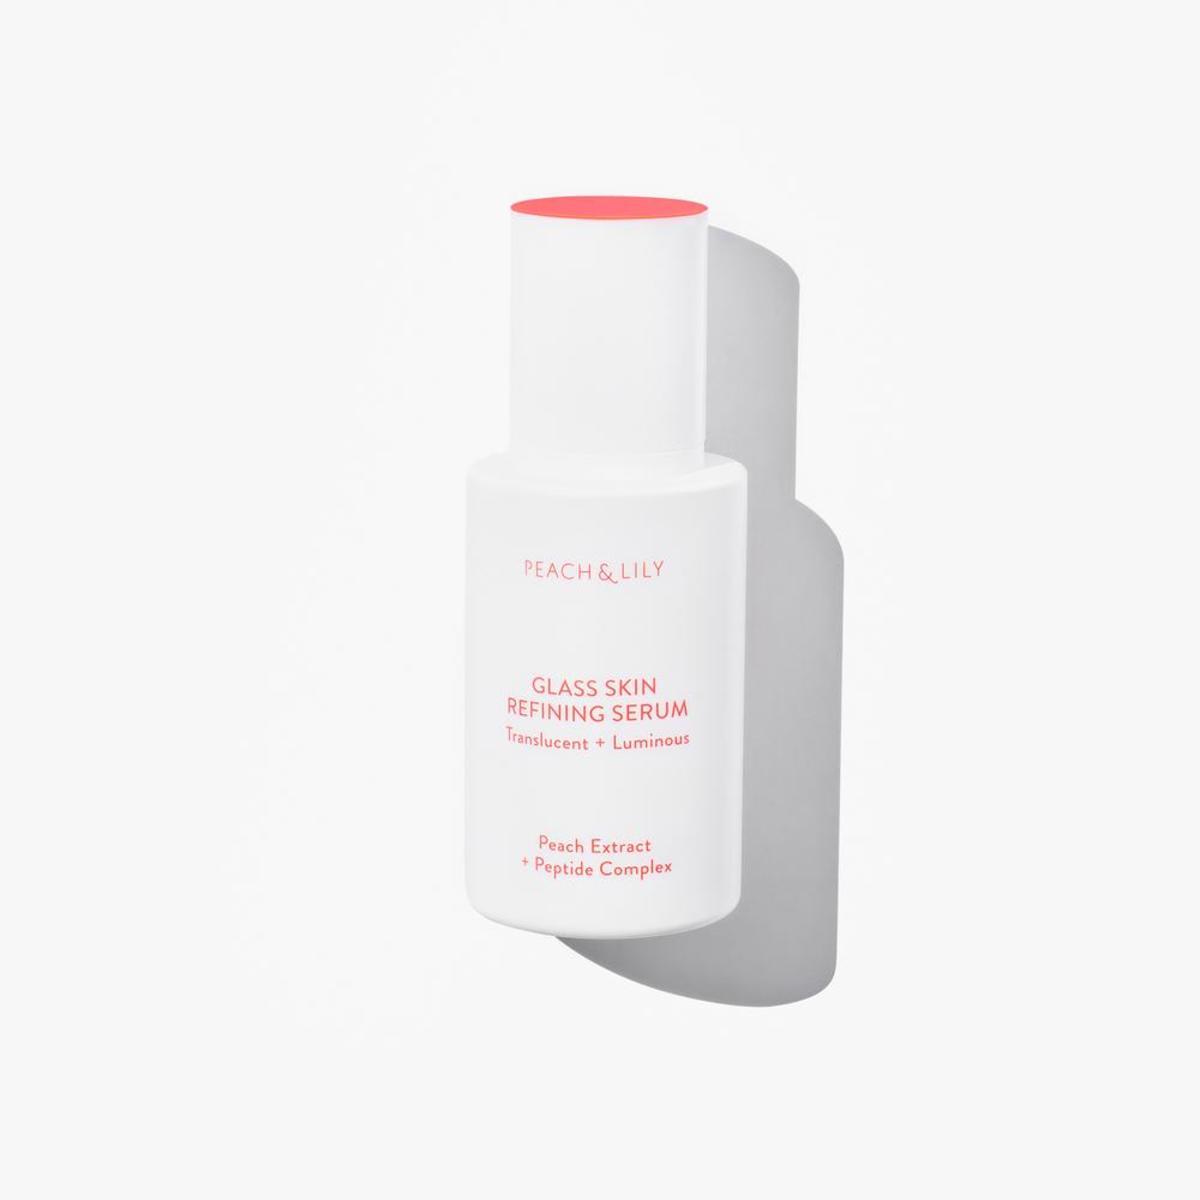 Peach and Lily - Glass Skin Refining Serum